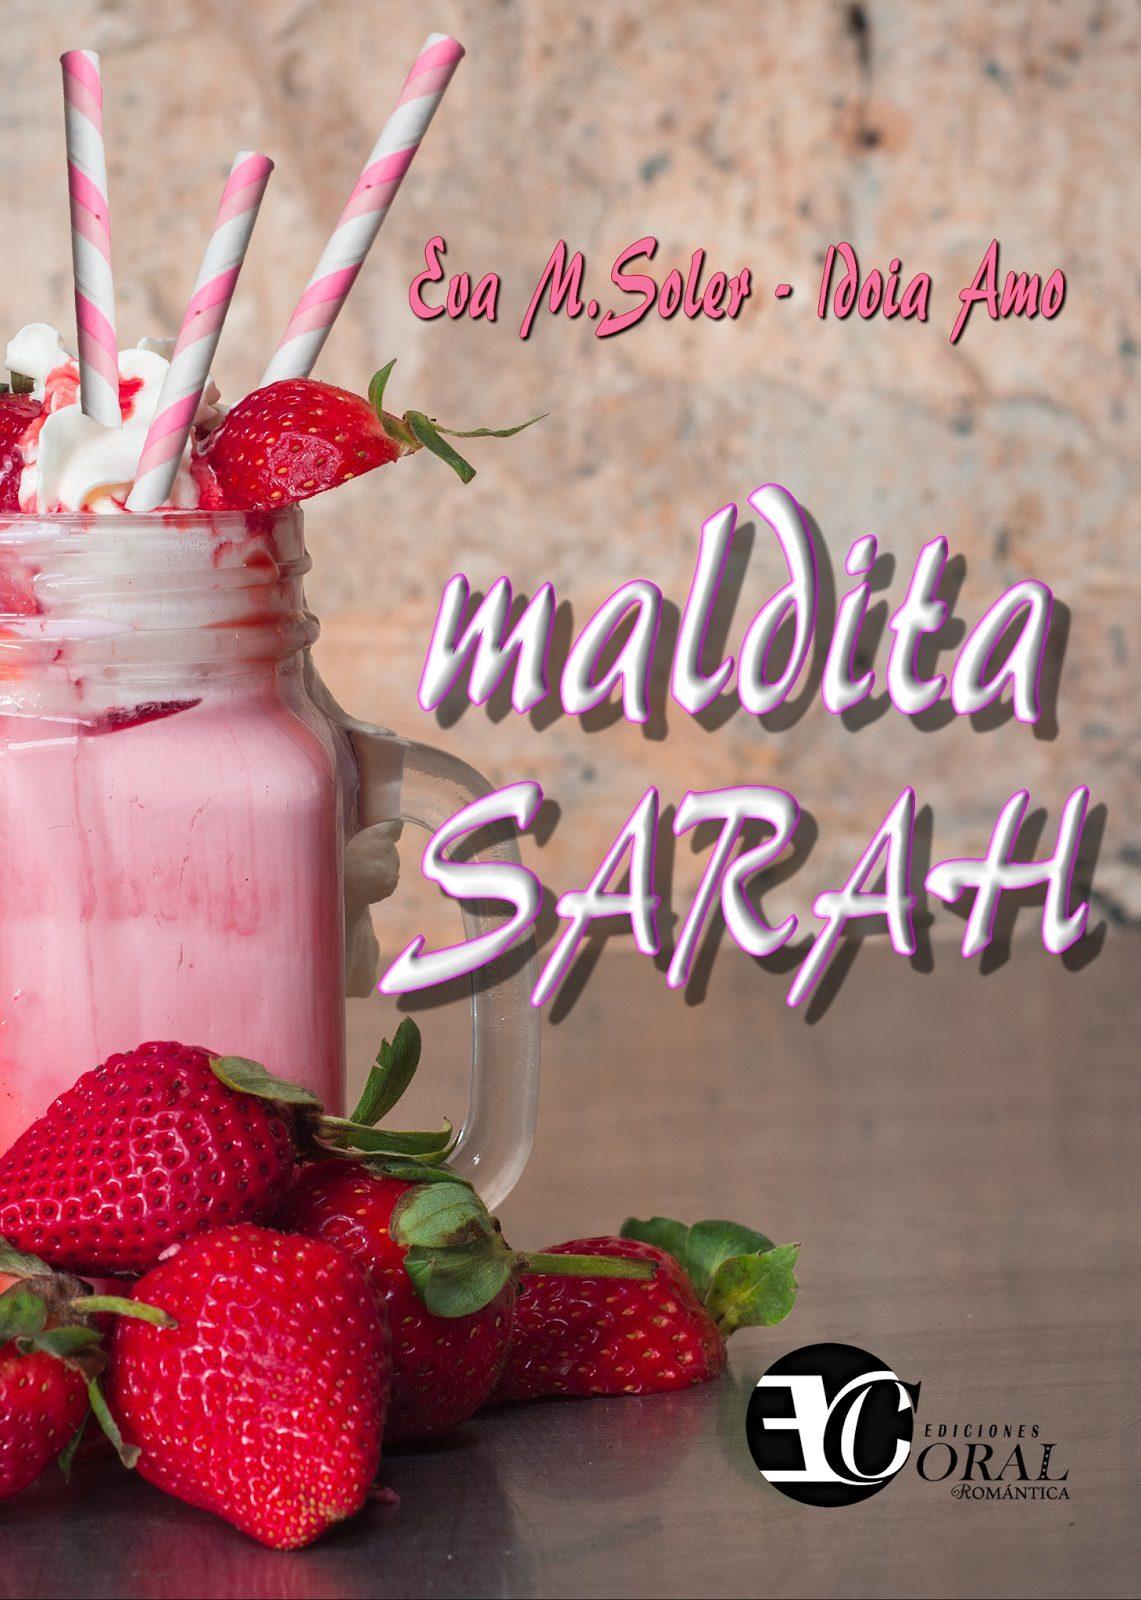 Maldita Sarah - Eva M. Soler & Idoia Amo (Rom)  9788494448096